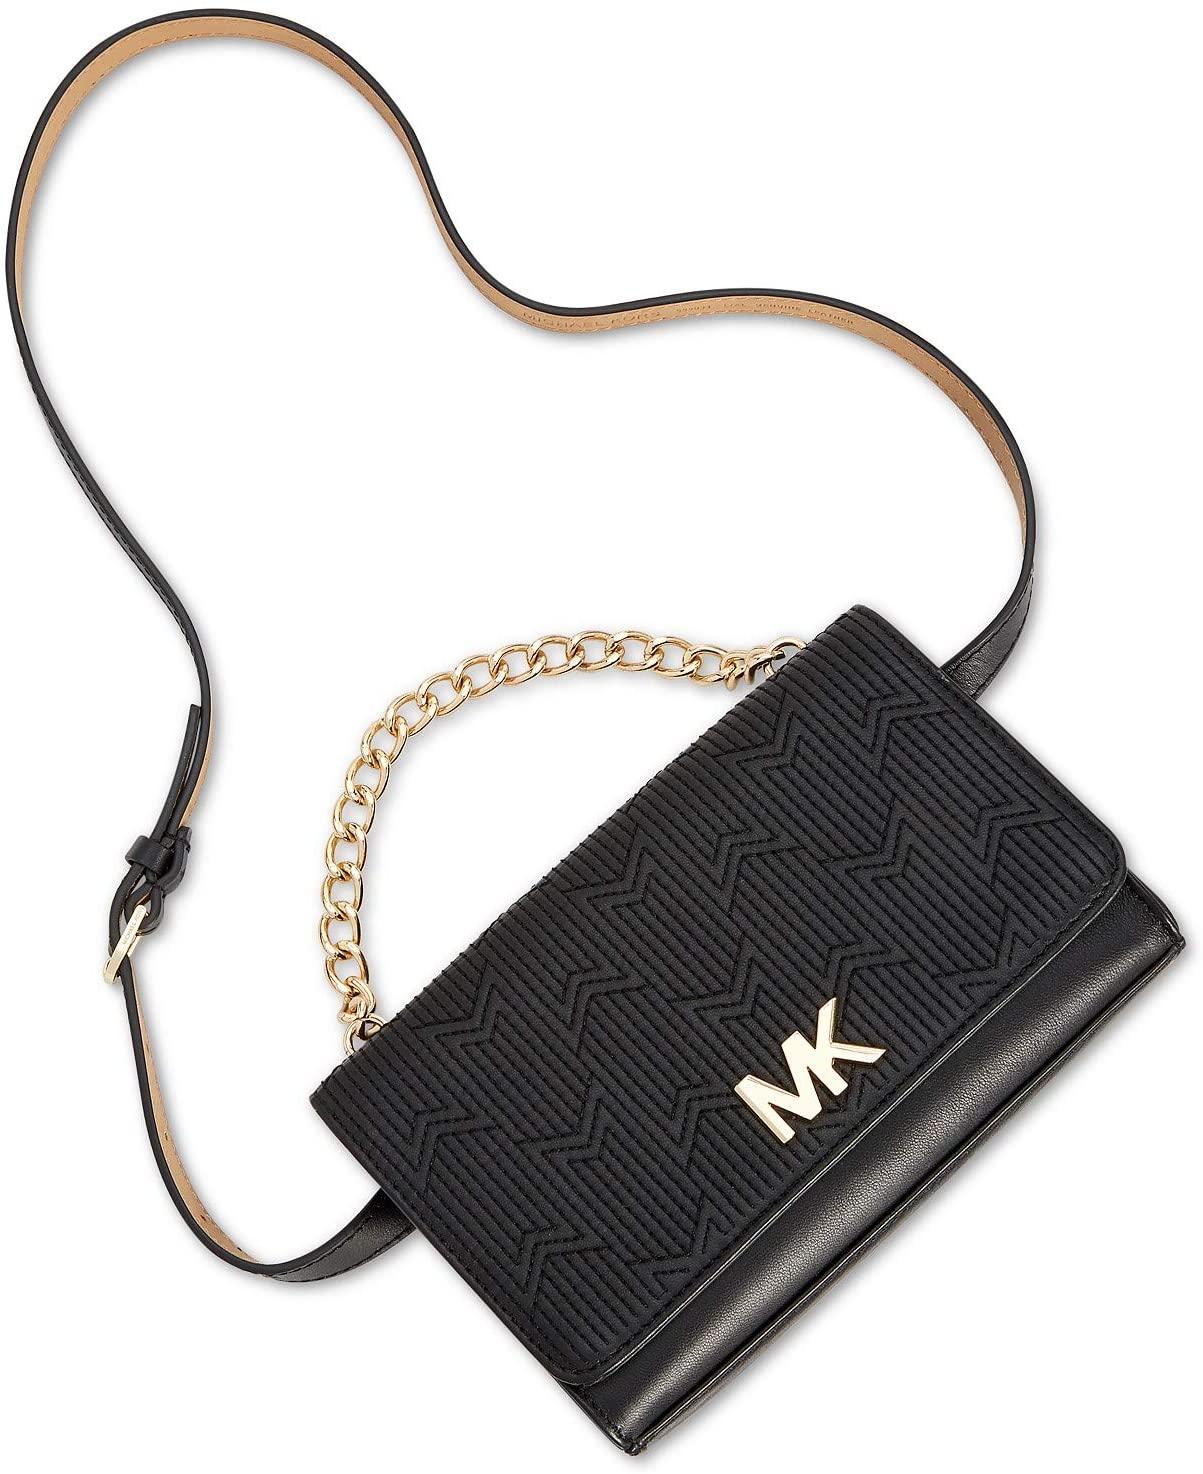 MICHAEL Michael Kors Deco M Quilted Leather Belt Bag Fanny Pack, Black (S/M)